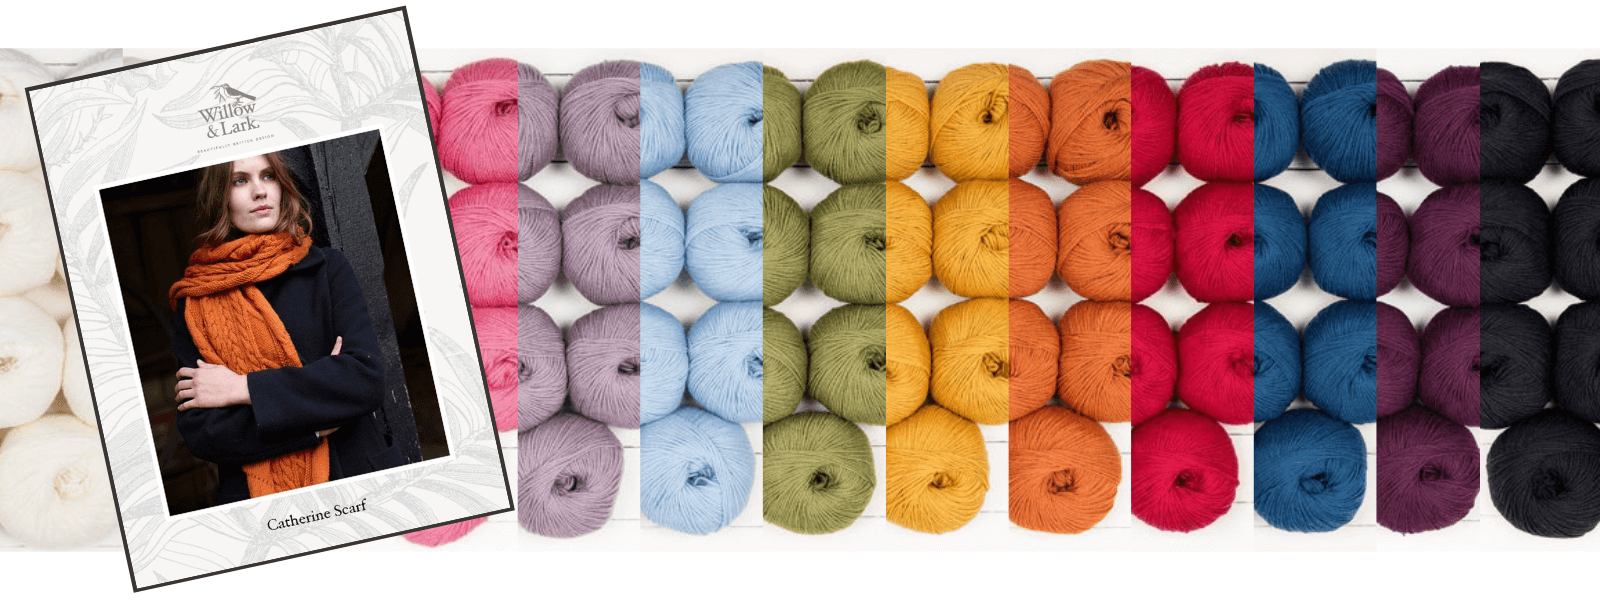 Catherine Scarf knit kit in 100% beautifully soft merino